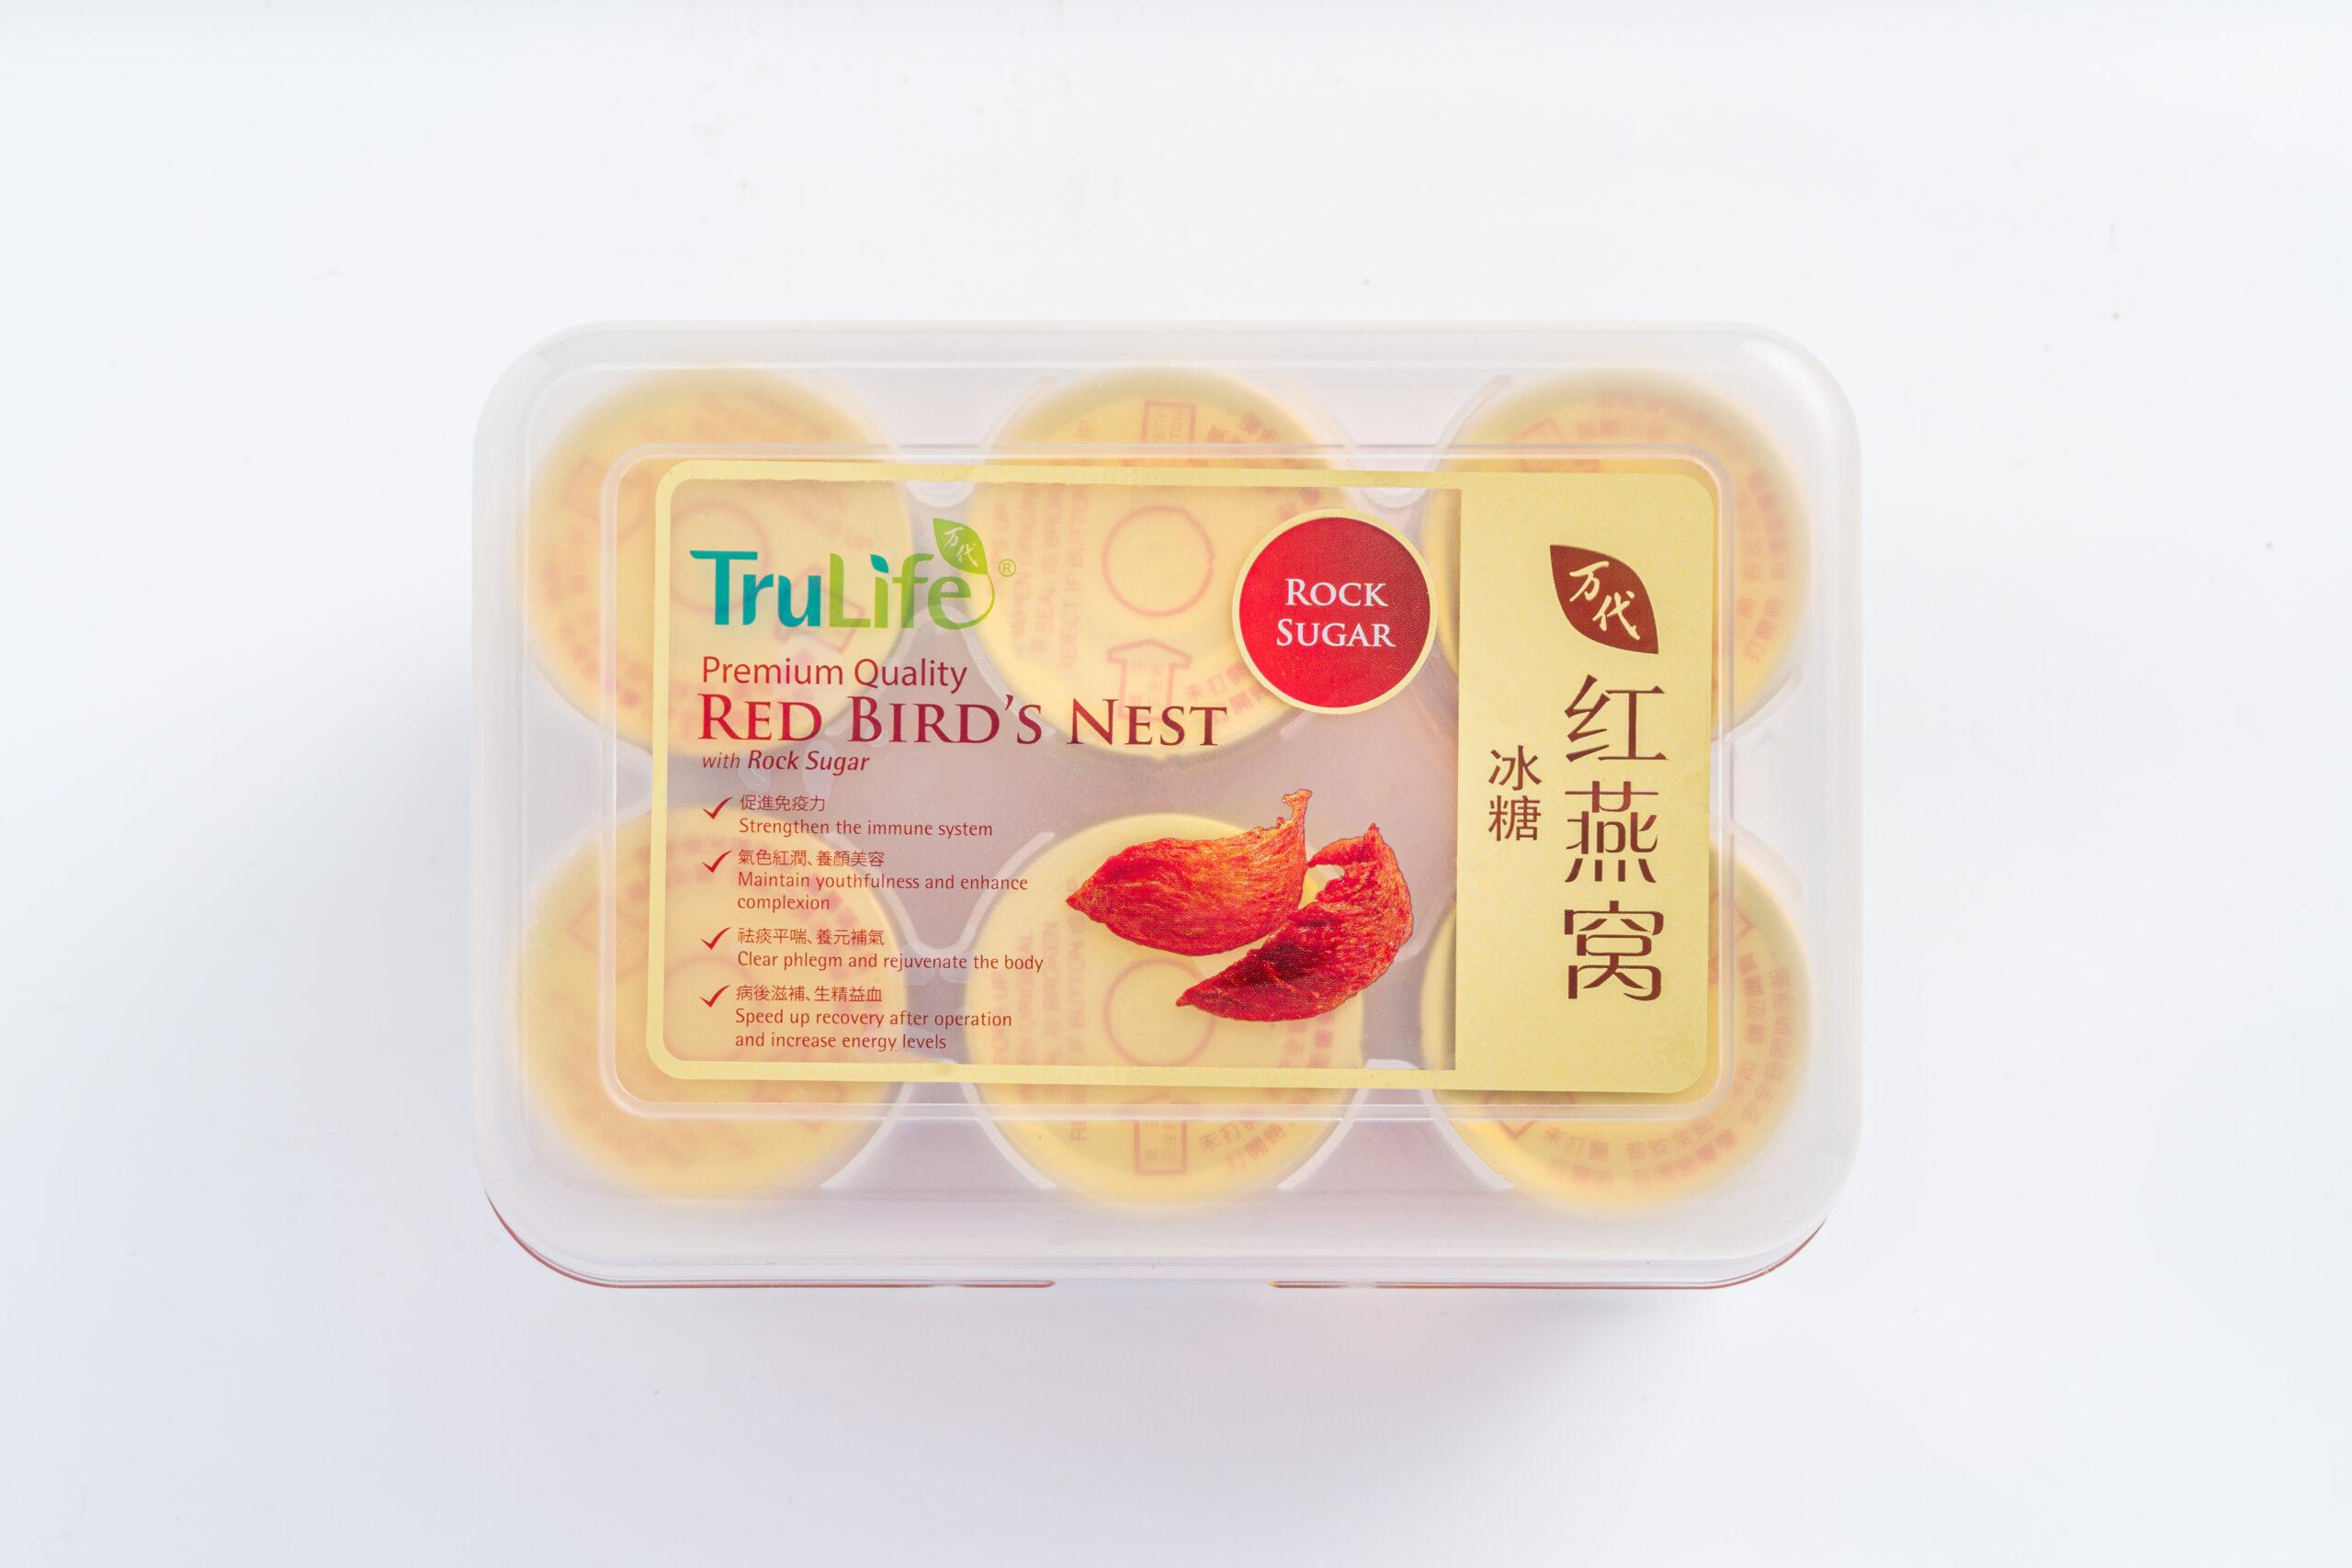 TruLife Premium Quality Red Bird's Nest with Rock Sugar - International